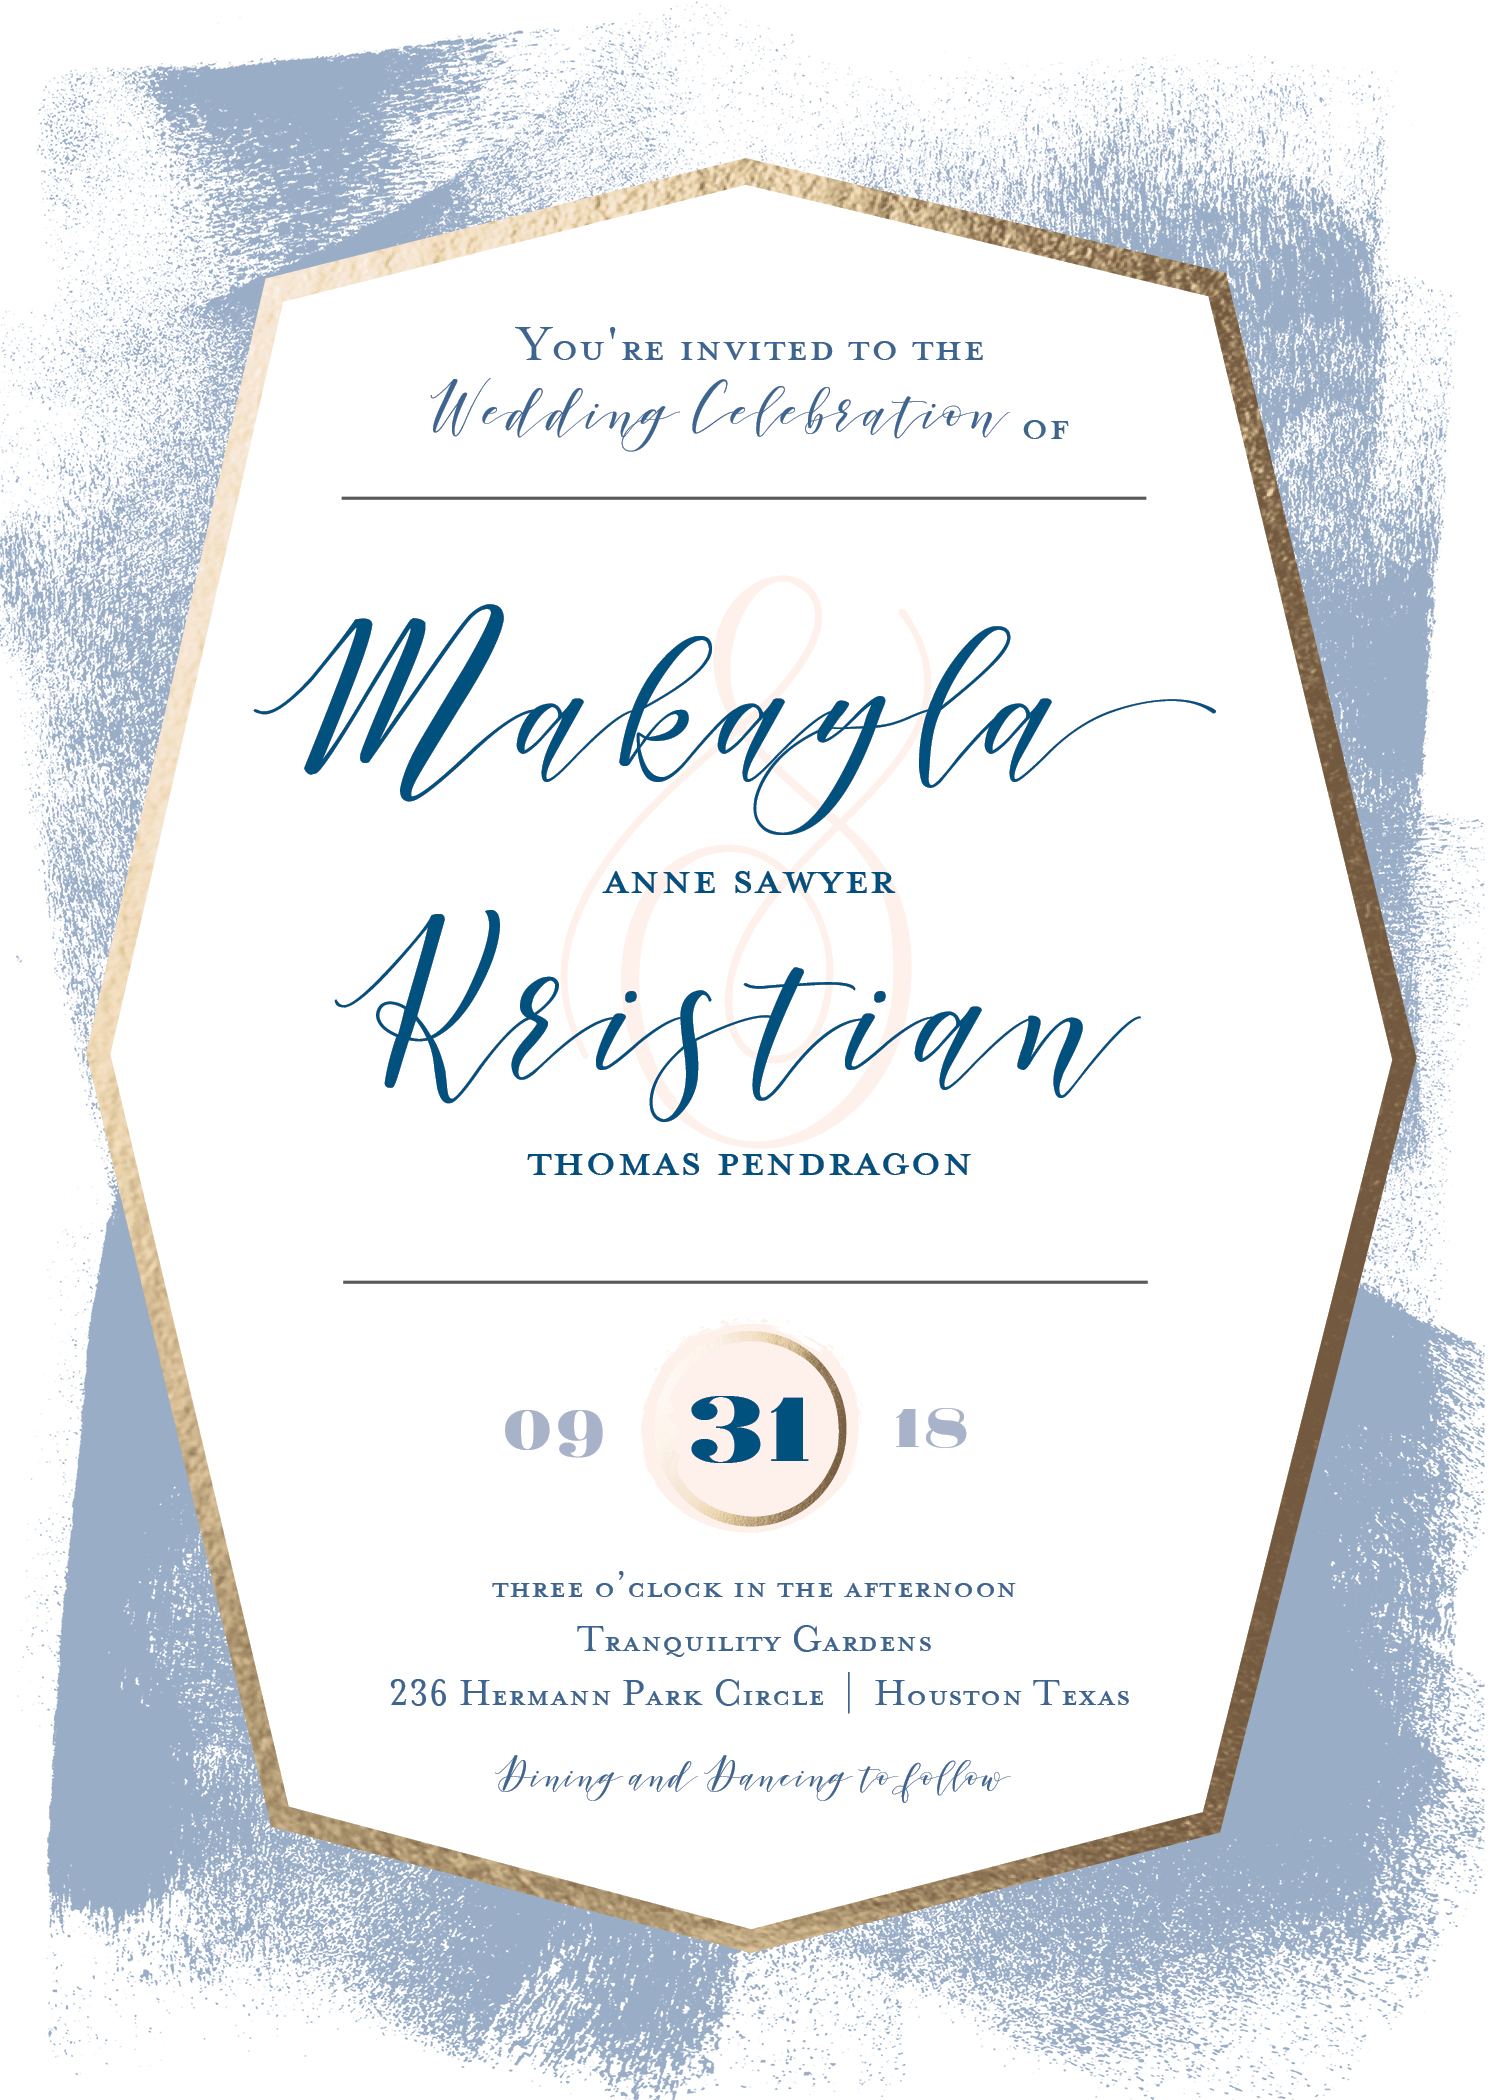 Gallery Gala Wedding Invitation